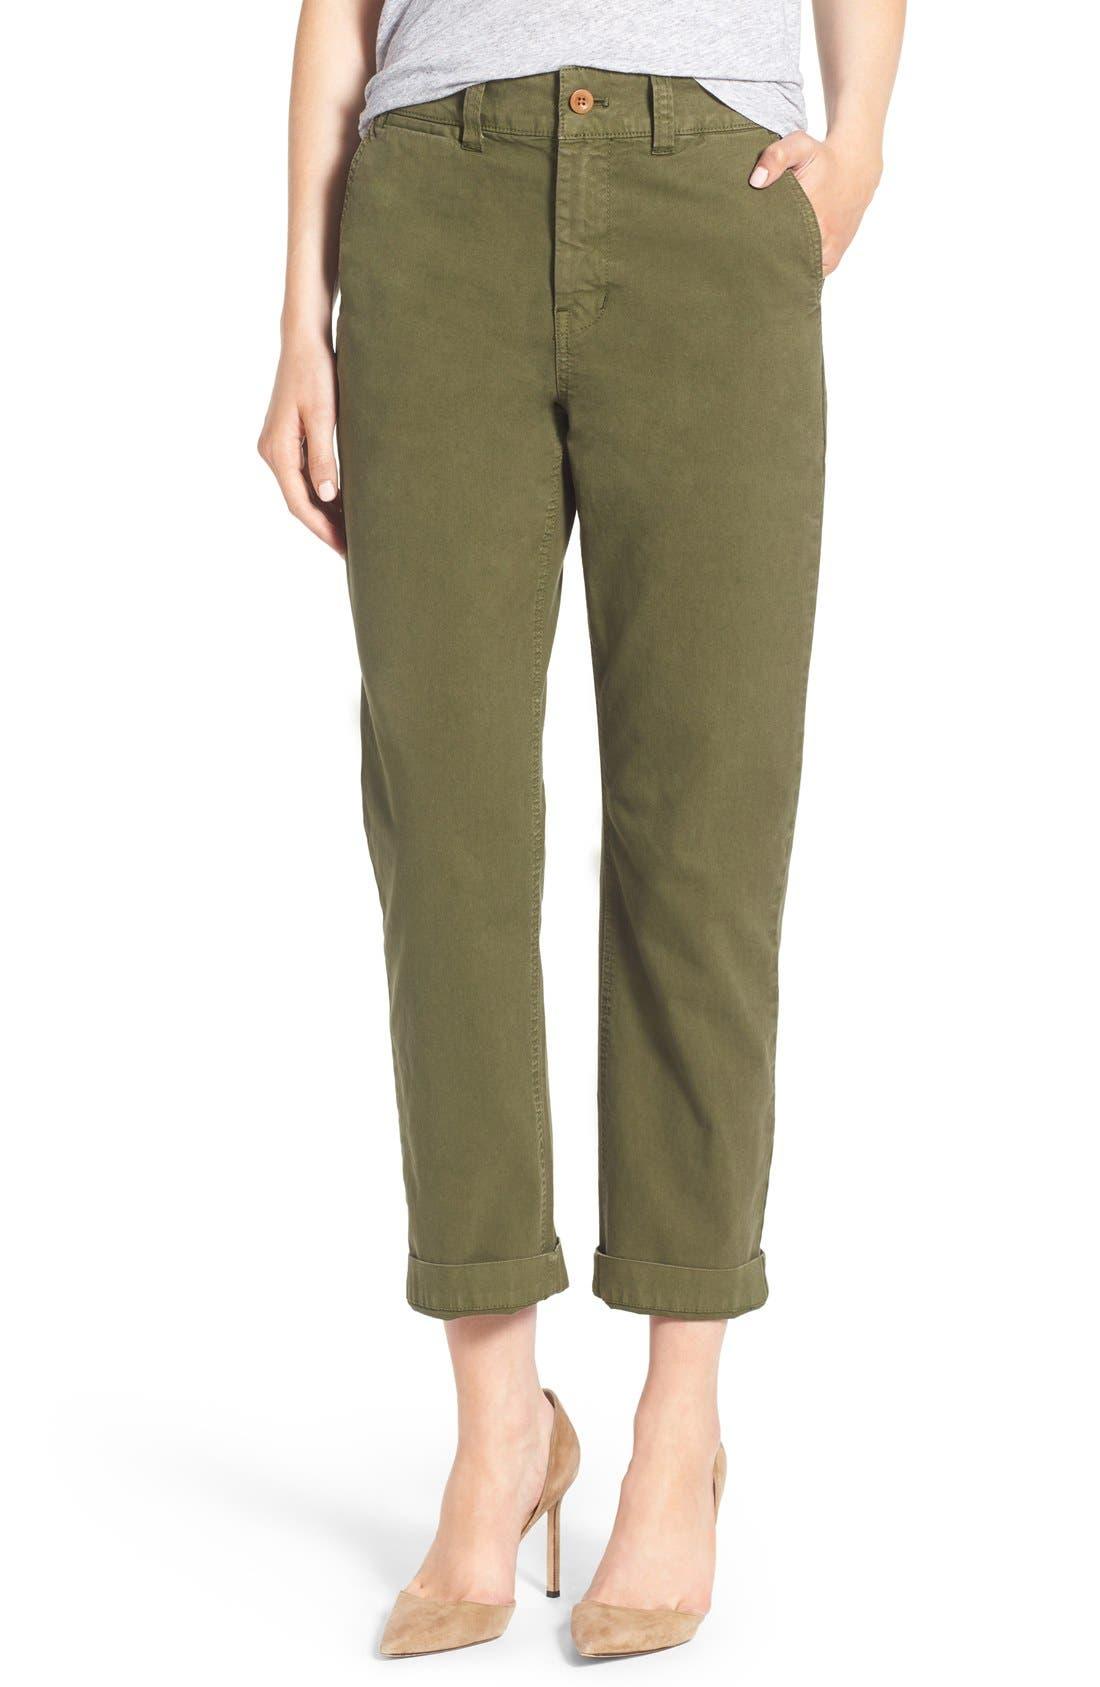 Alternate Image 1 Selected - Madewell High Rise Straight Leg Chino Pants